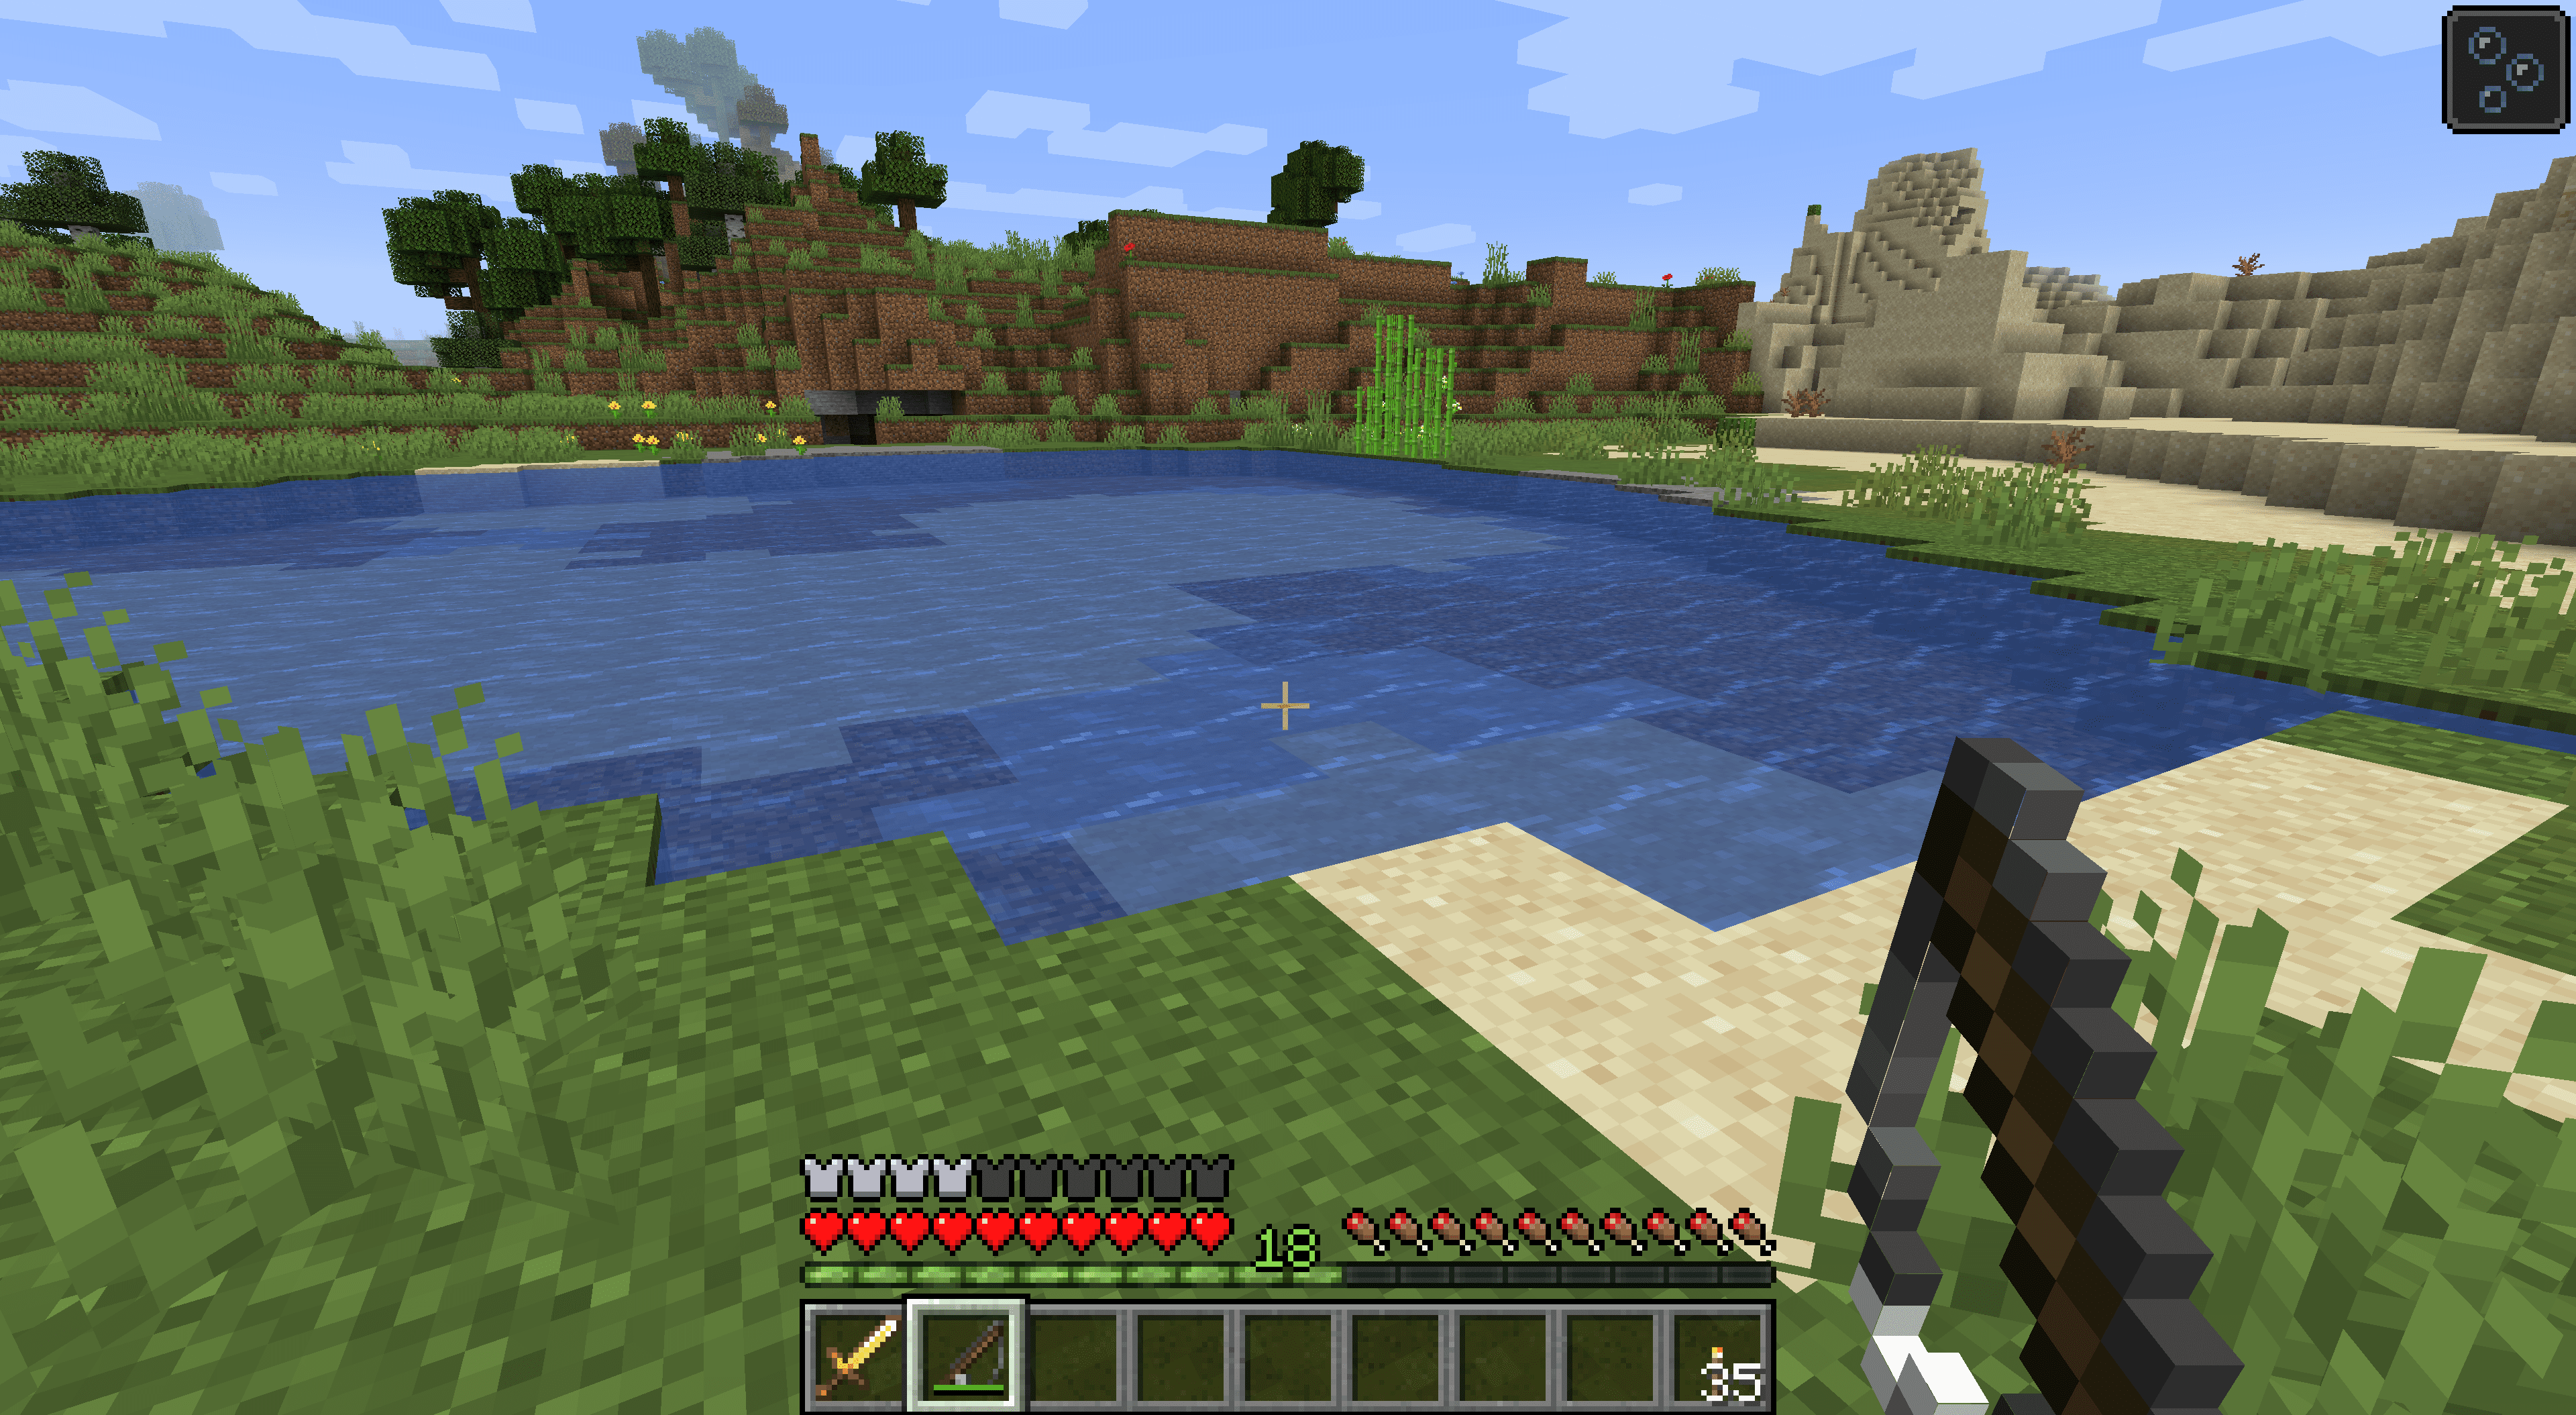 Fishing in Minecraft.